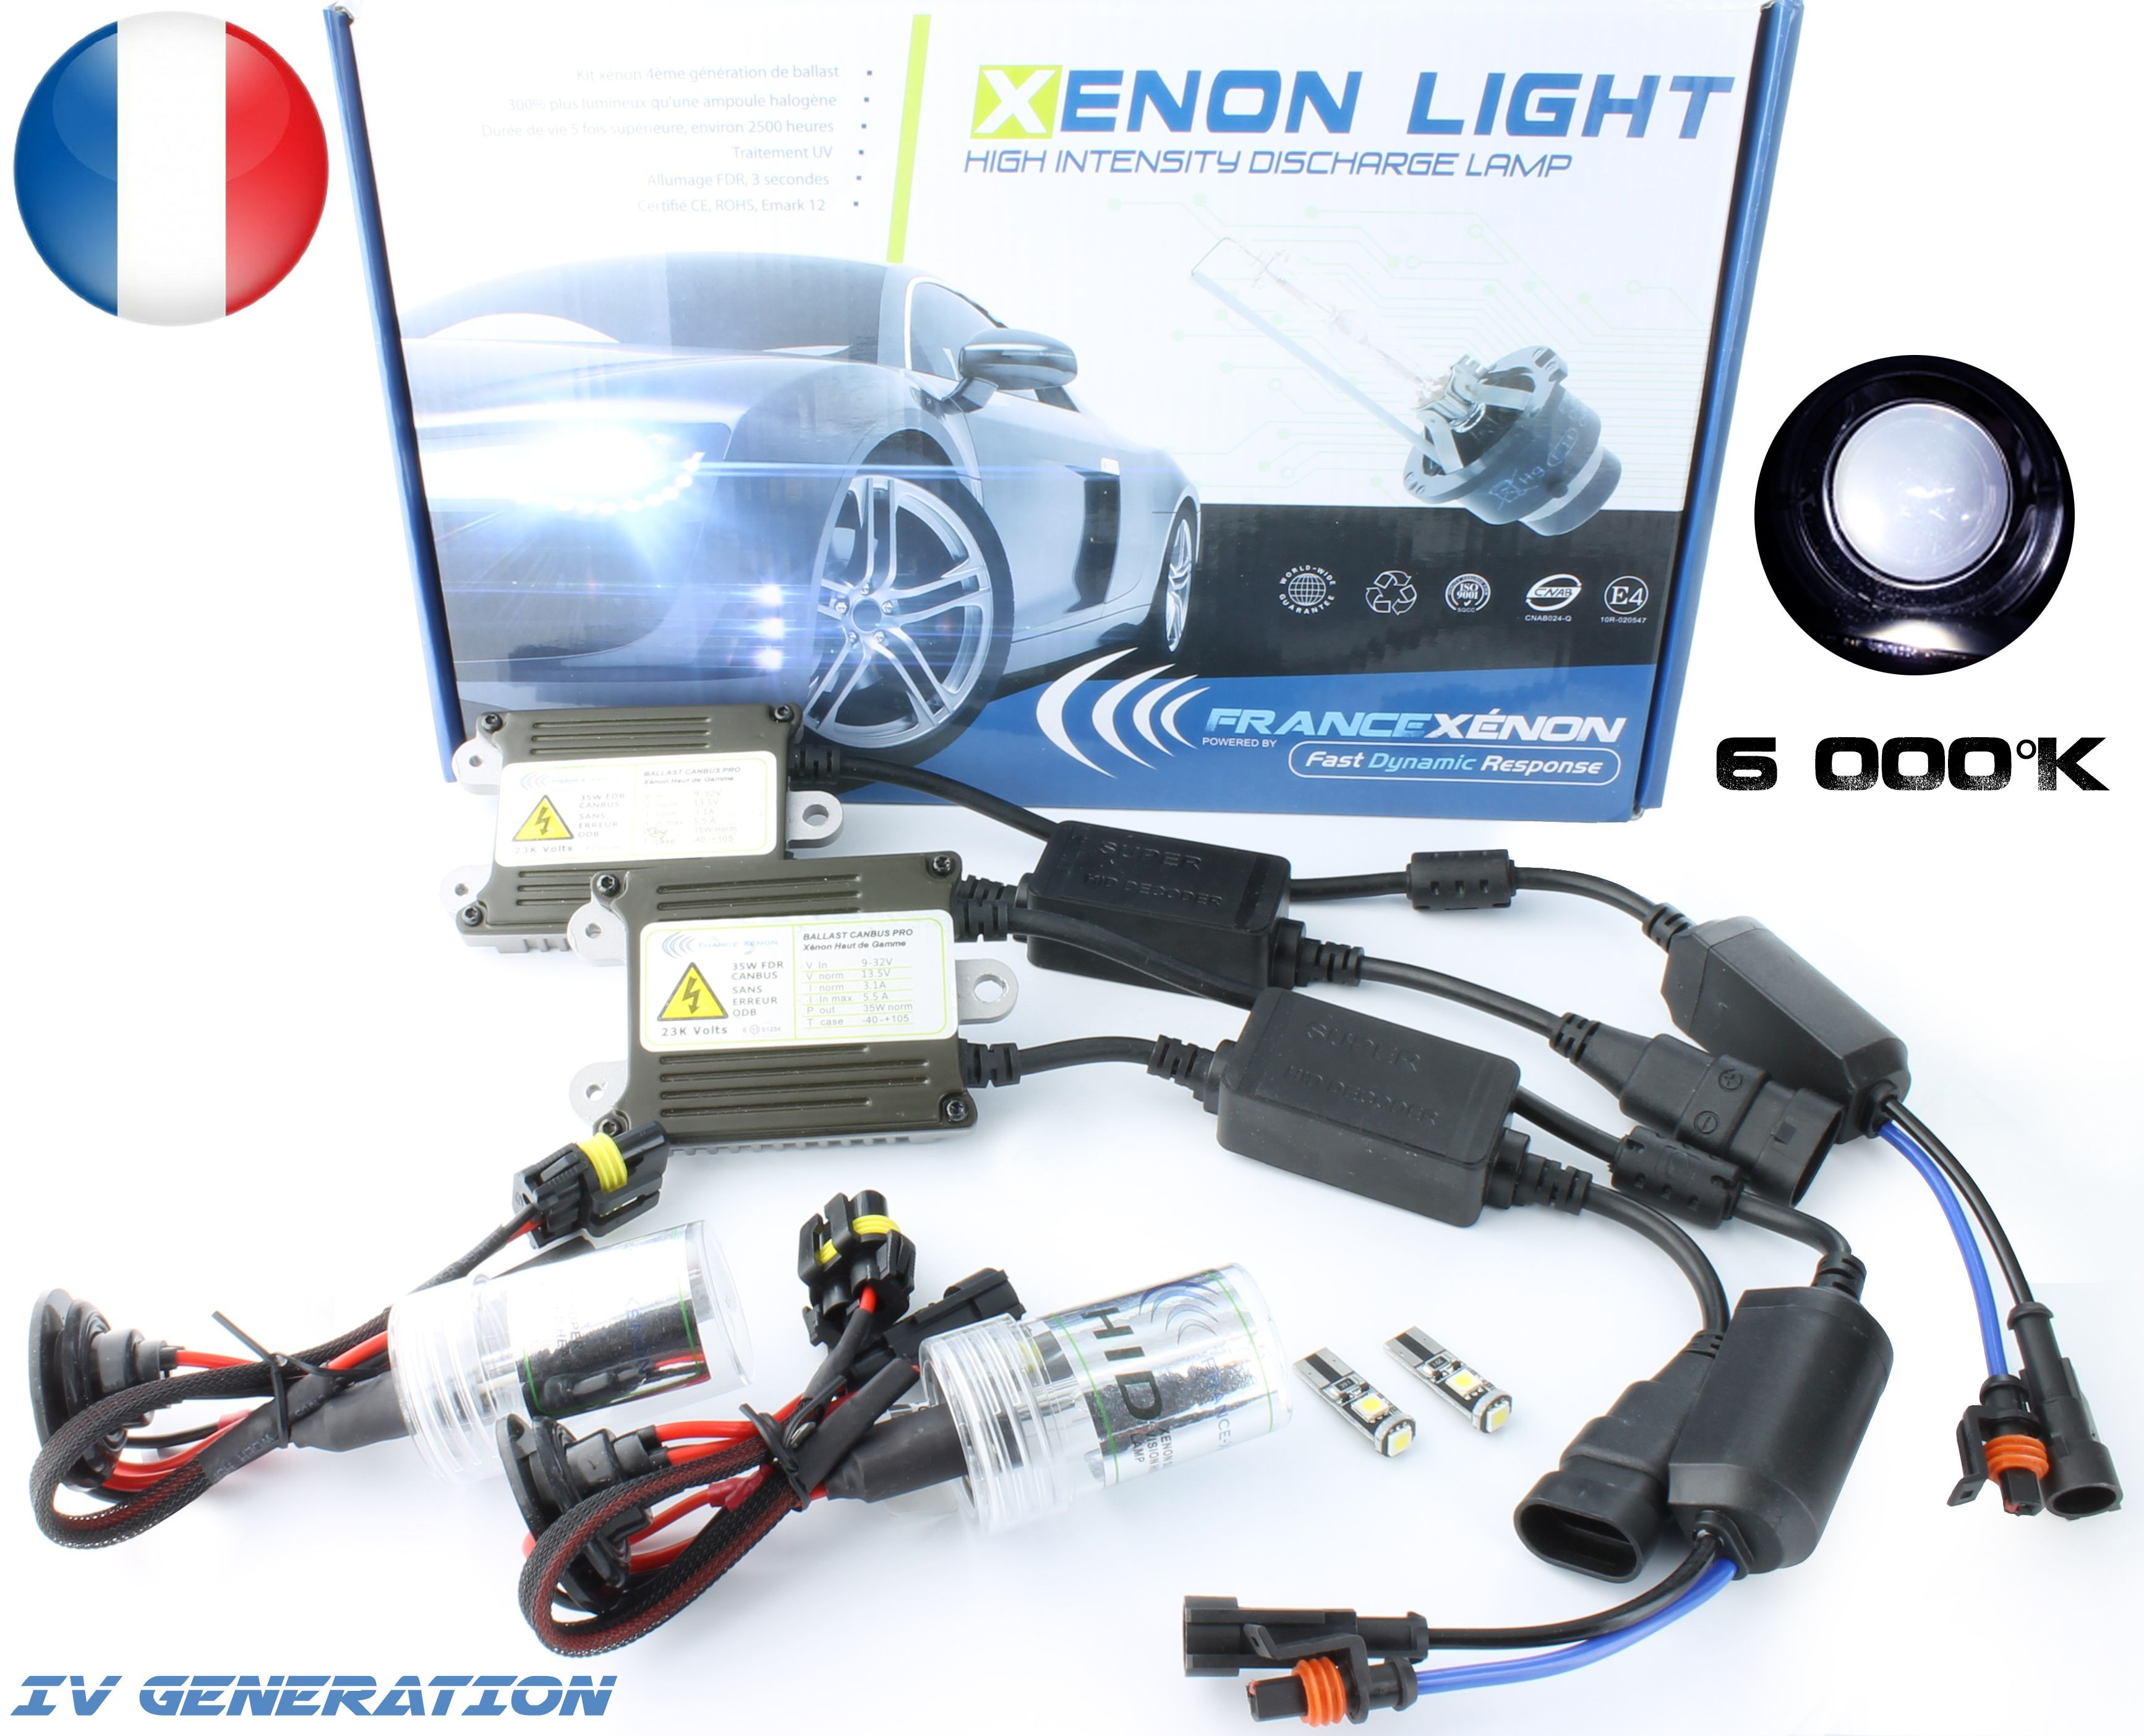 H4 6000k Xenon Canbus Hid Kit To Fit Seat Ibiza Models Auto Motorrad Teile Lampen Led Valtek Cl